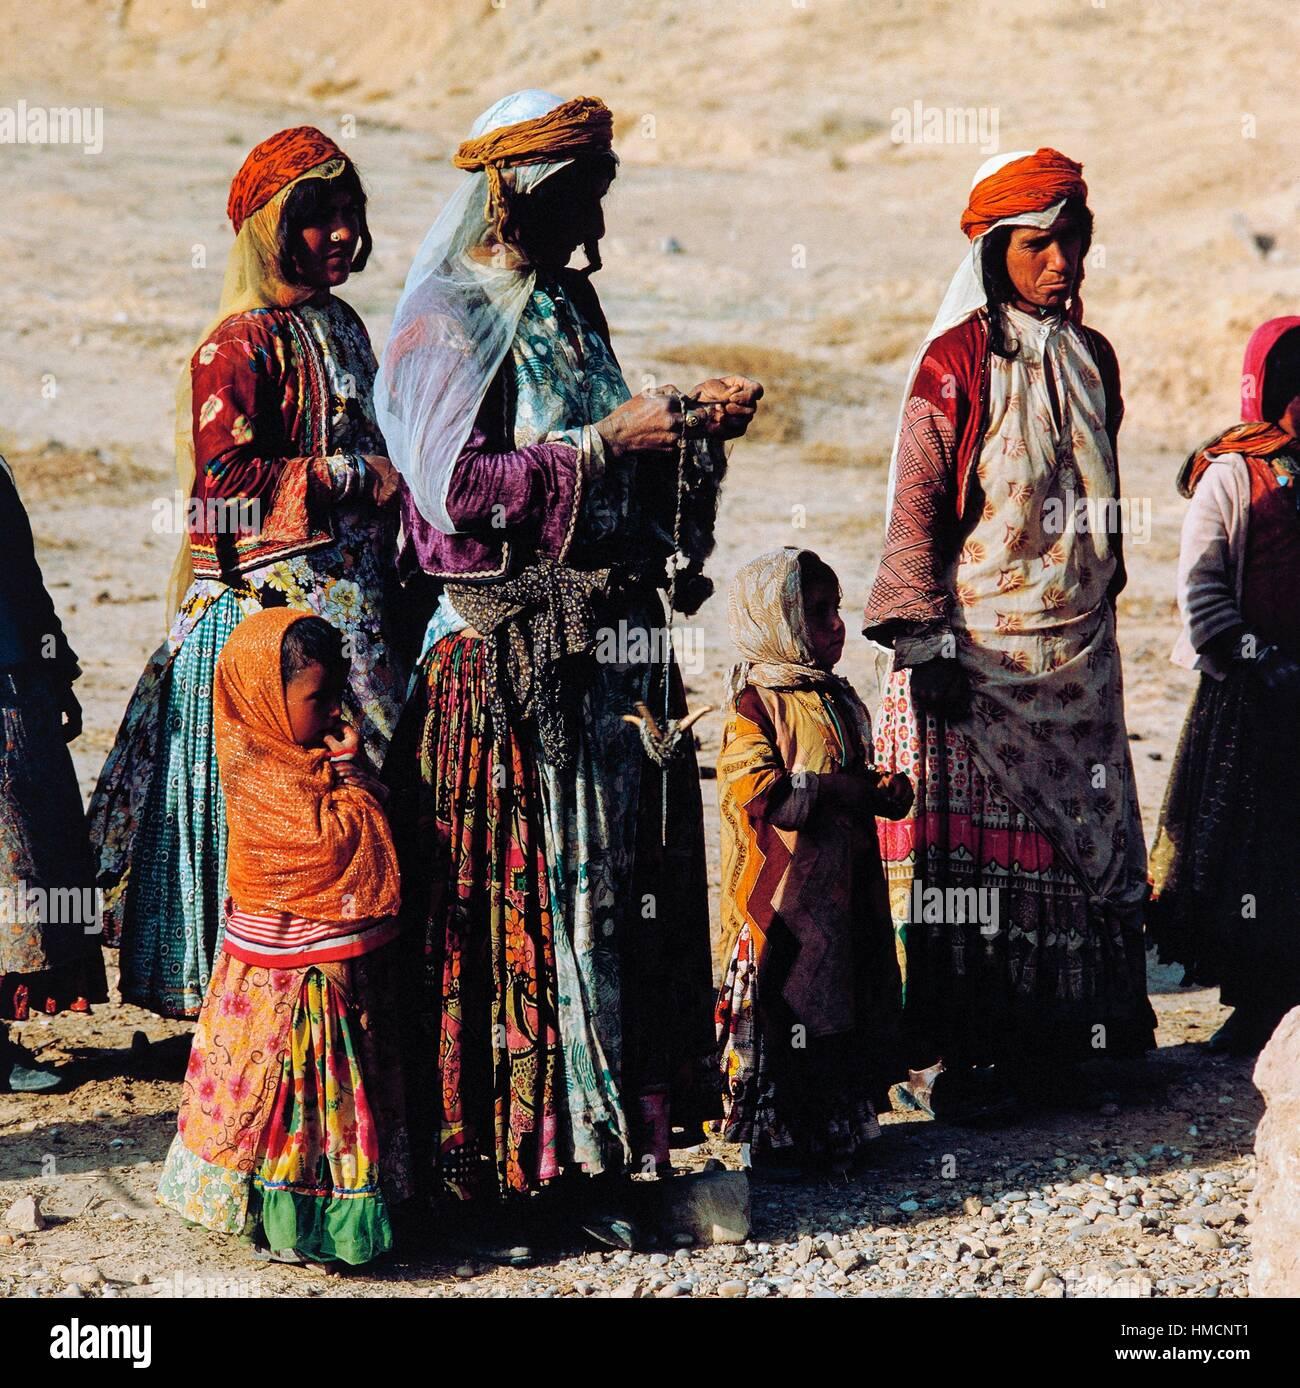 Qashqai women and girls, Zagros Mountains, Iran. - Stock Image